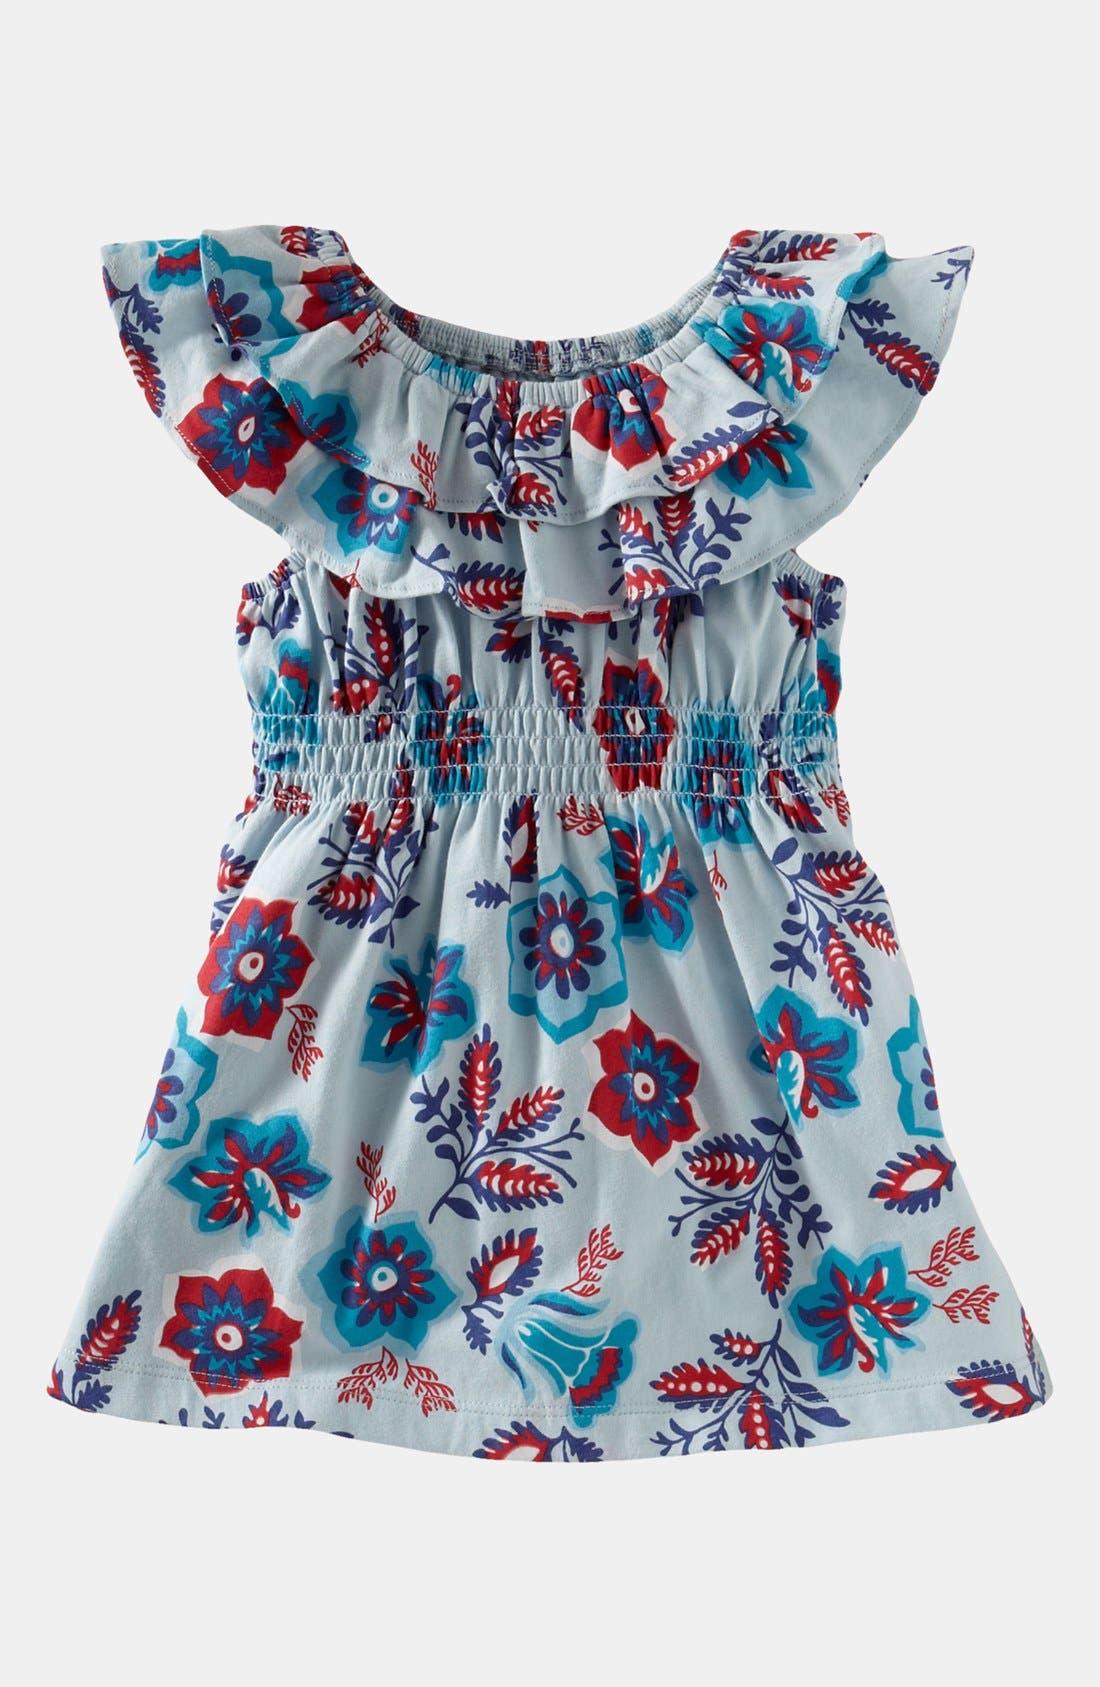 Alternate Image 1 Selected - Tea Collection 'Sea Gypsy' Ruffle Tunic (Little Girls & Big Girls)